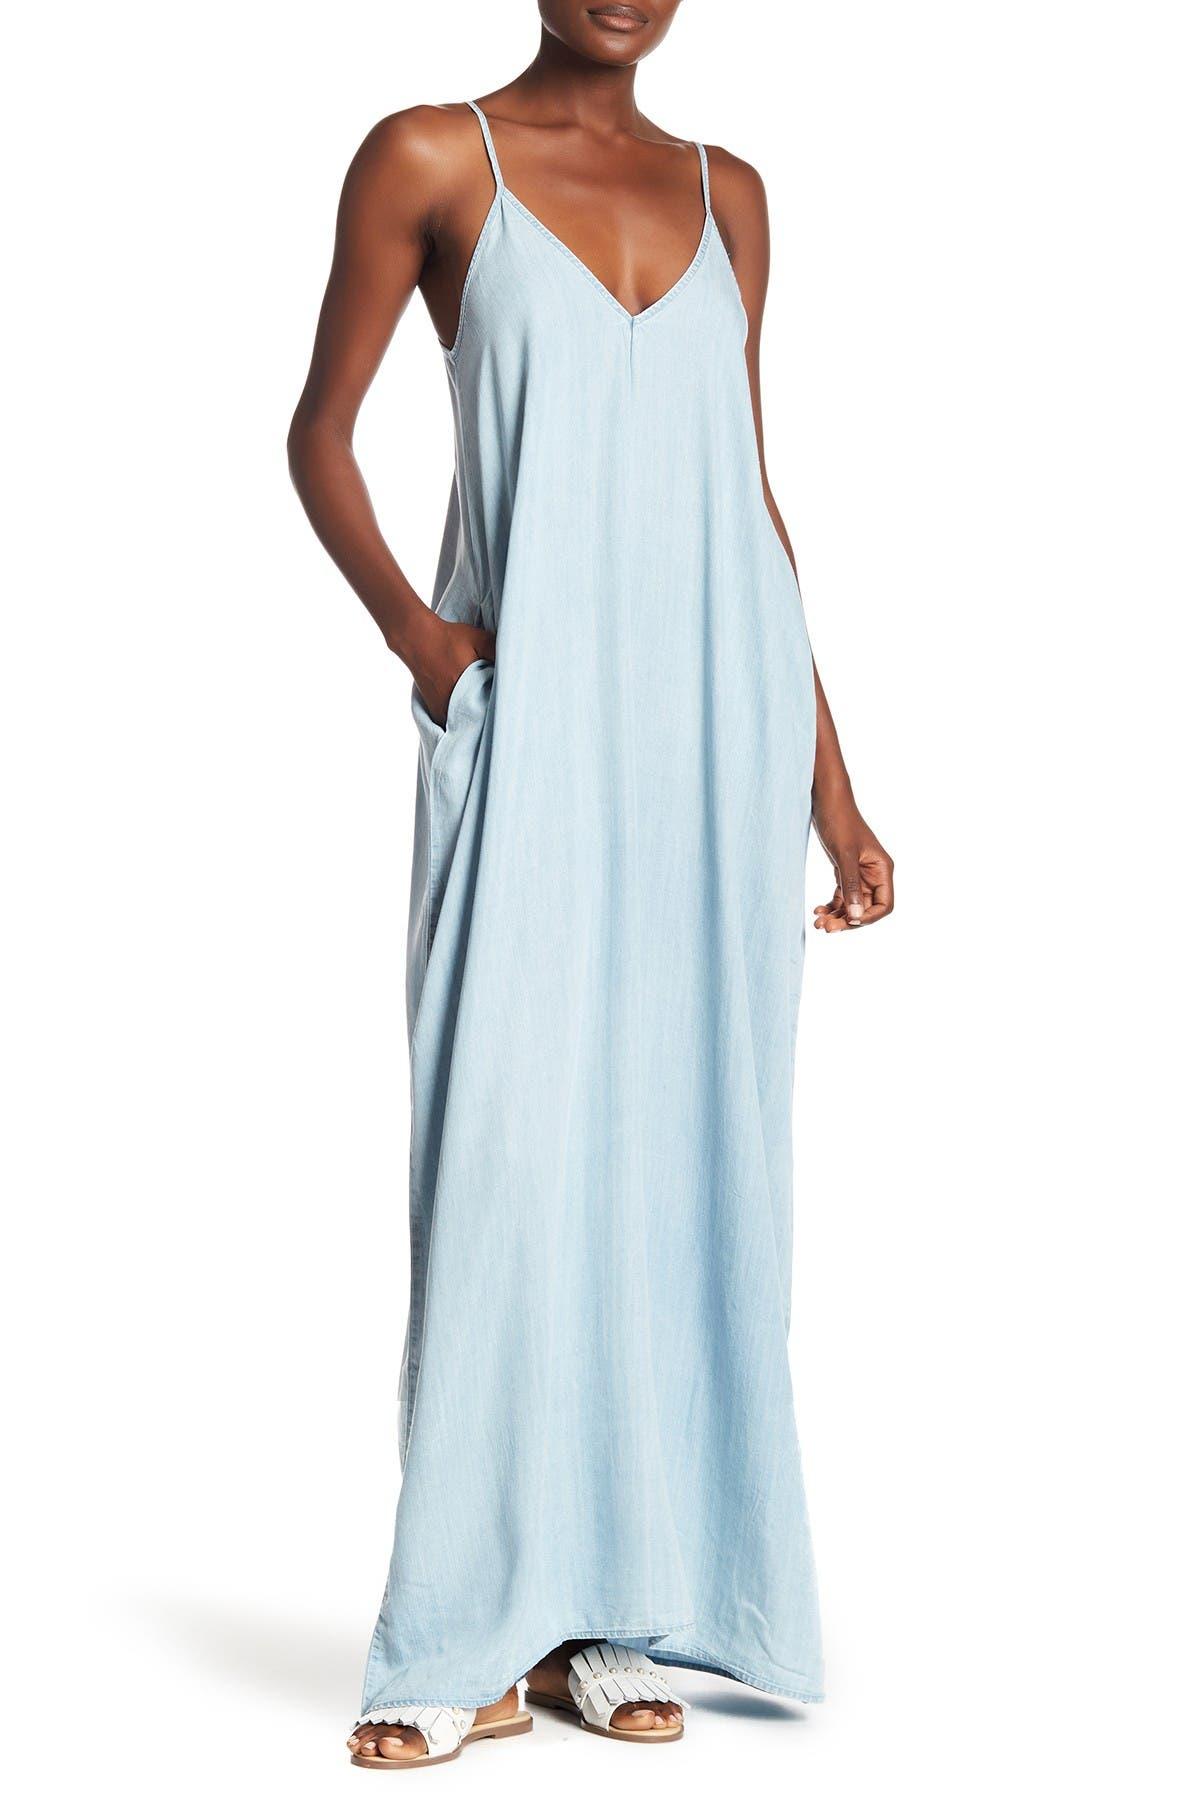 Image of Love Stitch Cape Cod Mila Maxi Dress